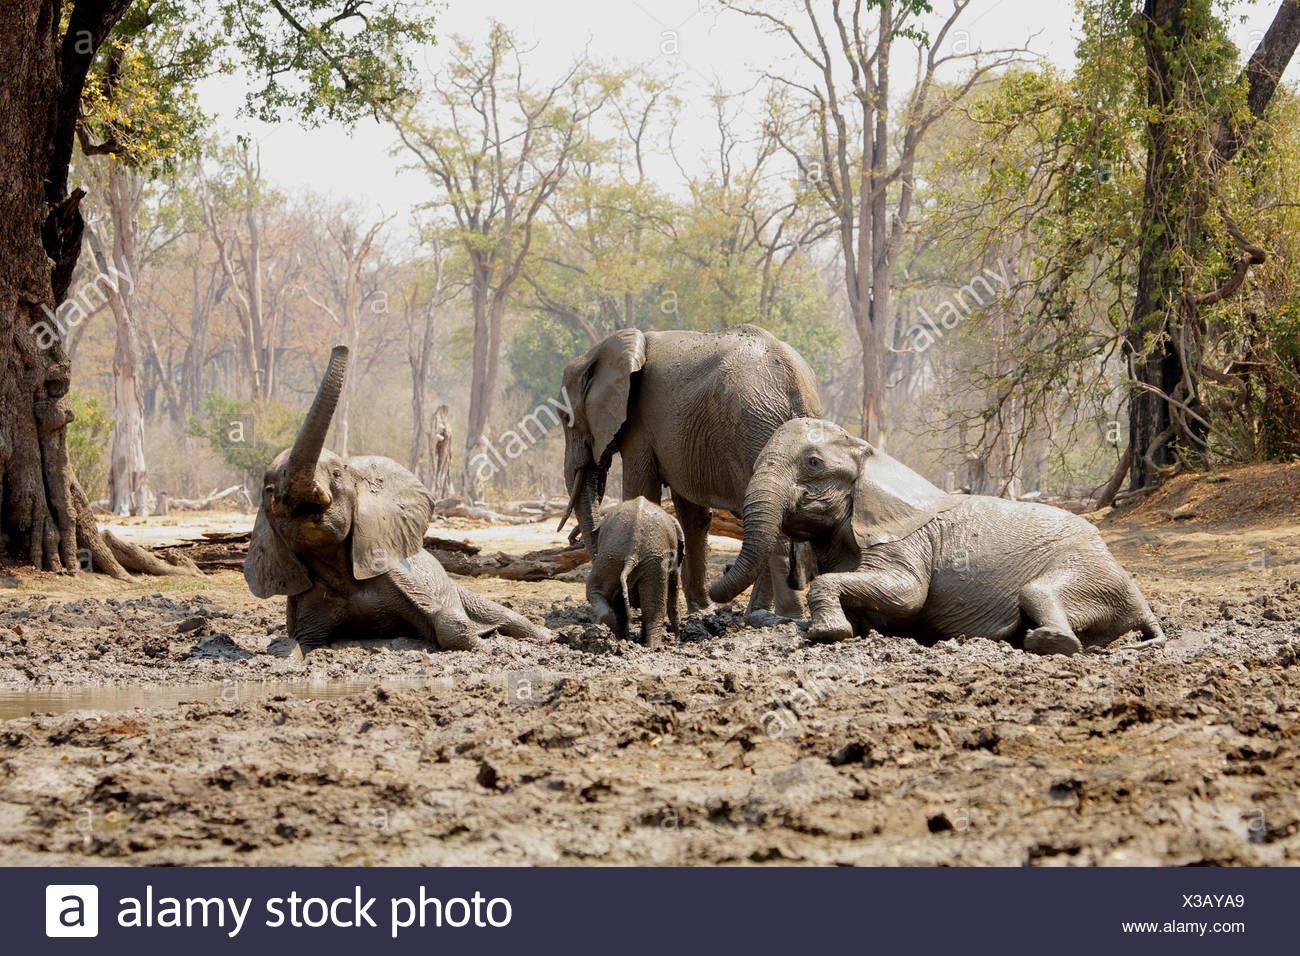 African Elephants bathing in mud, Mana Pools, Zimbabwe - Stock Image